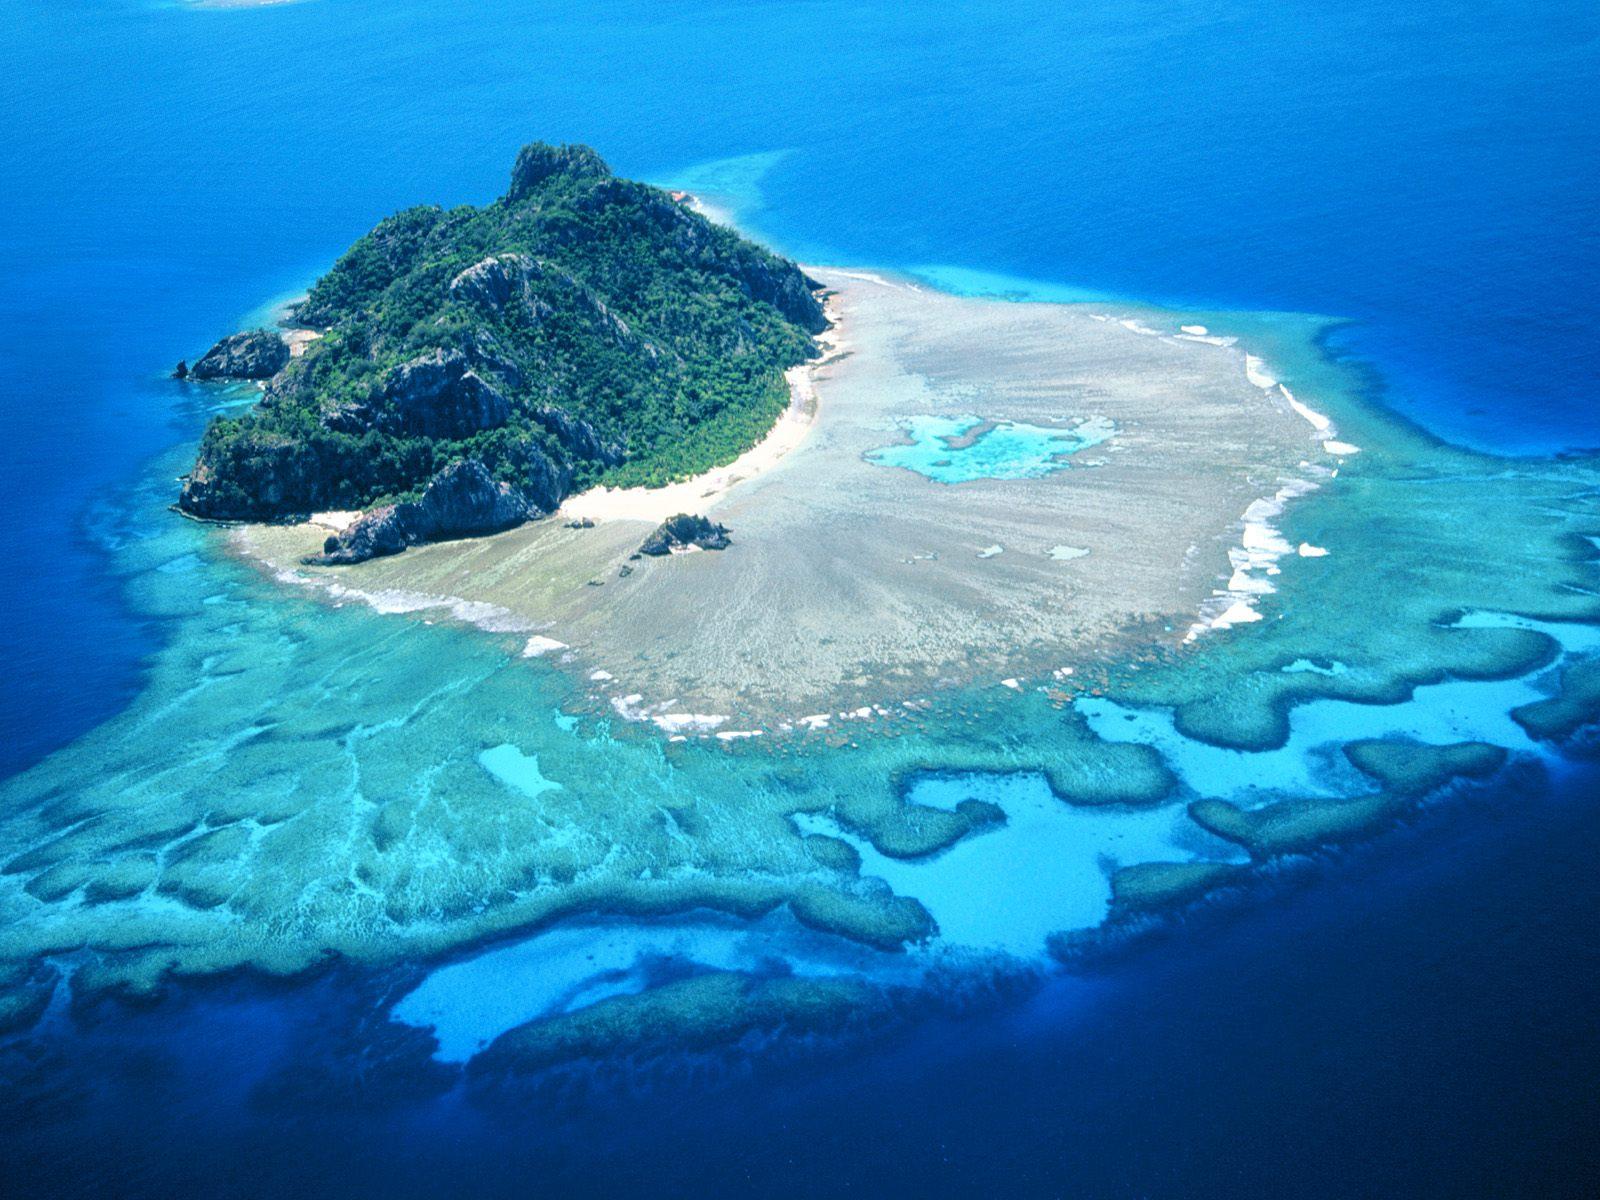 Click image for larger version  Name:Monuriki Island, Mamanucas, Fiji.jpg Views:342 Size:309.3 KB ID:15232